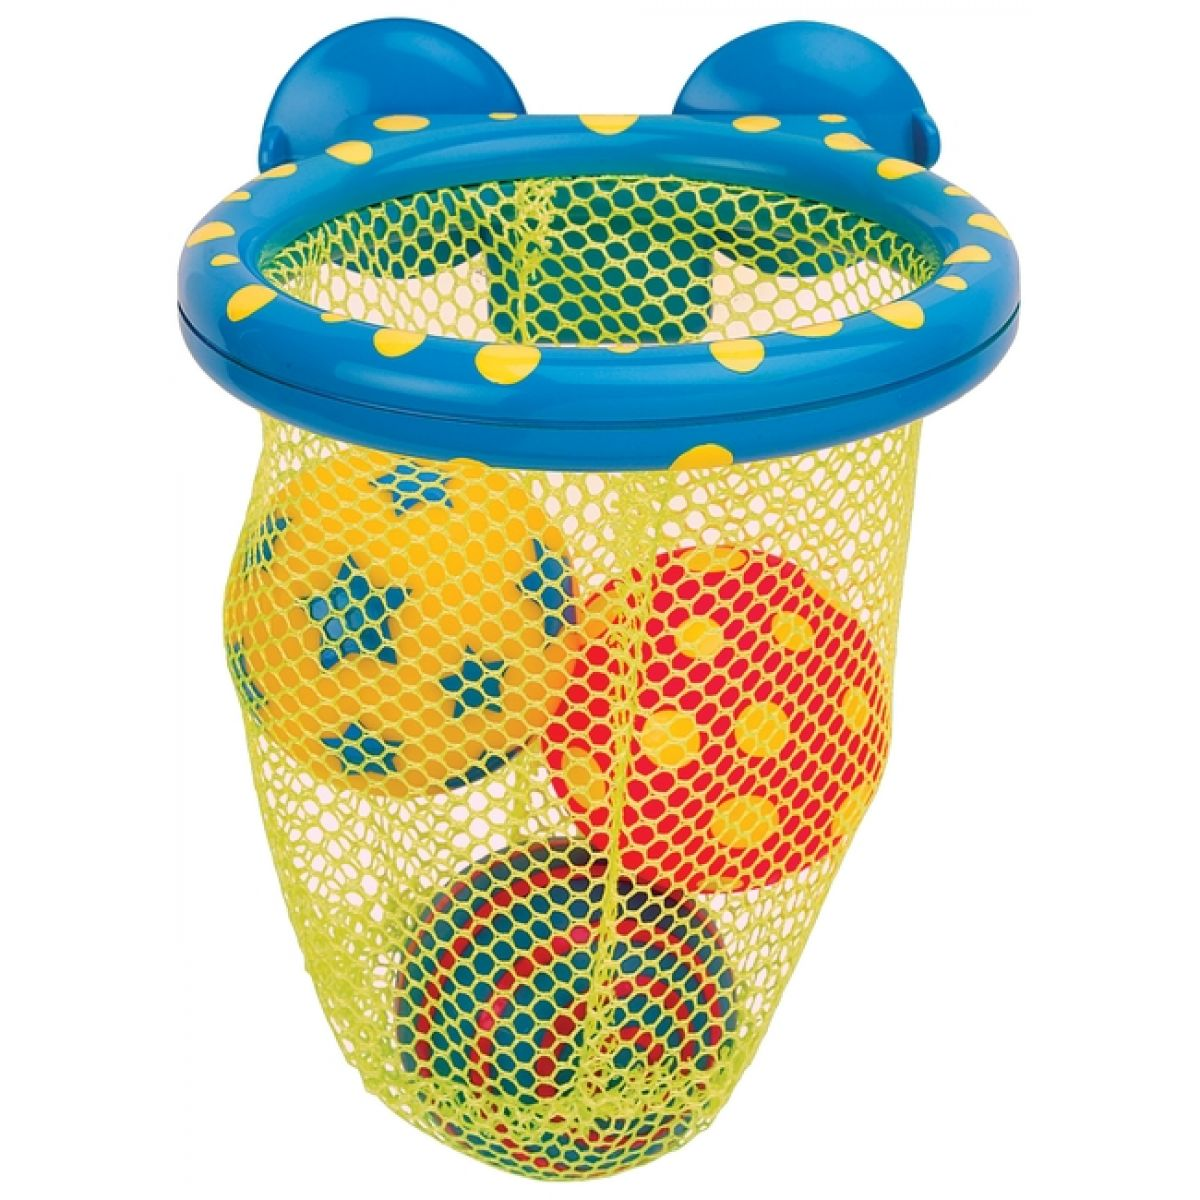 Alex Hračka do vody koš s míčky